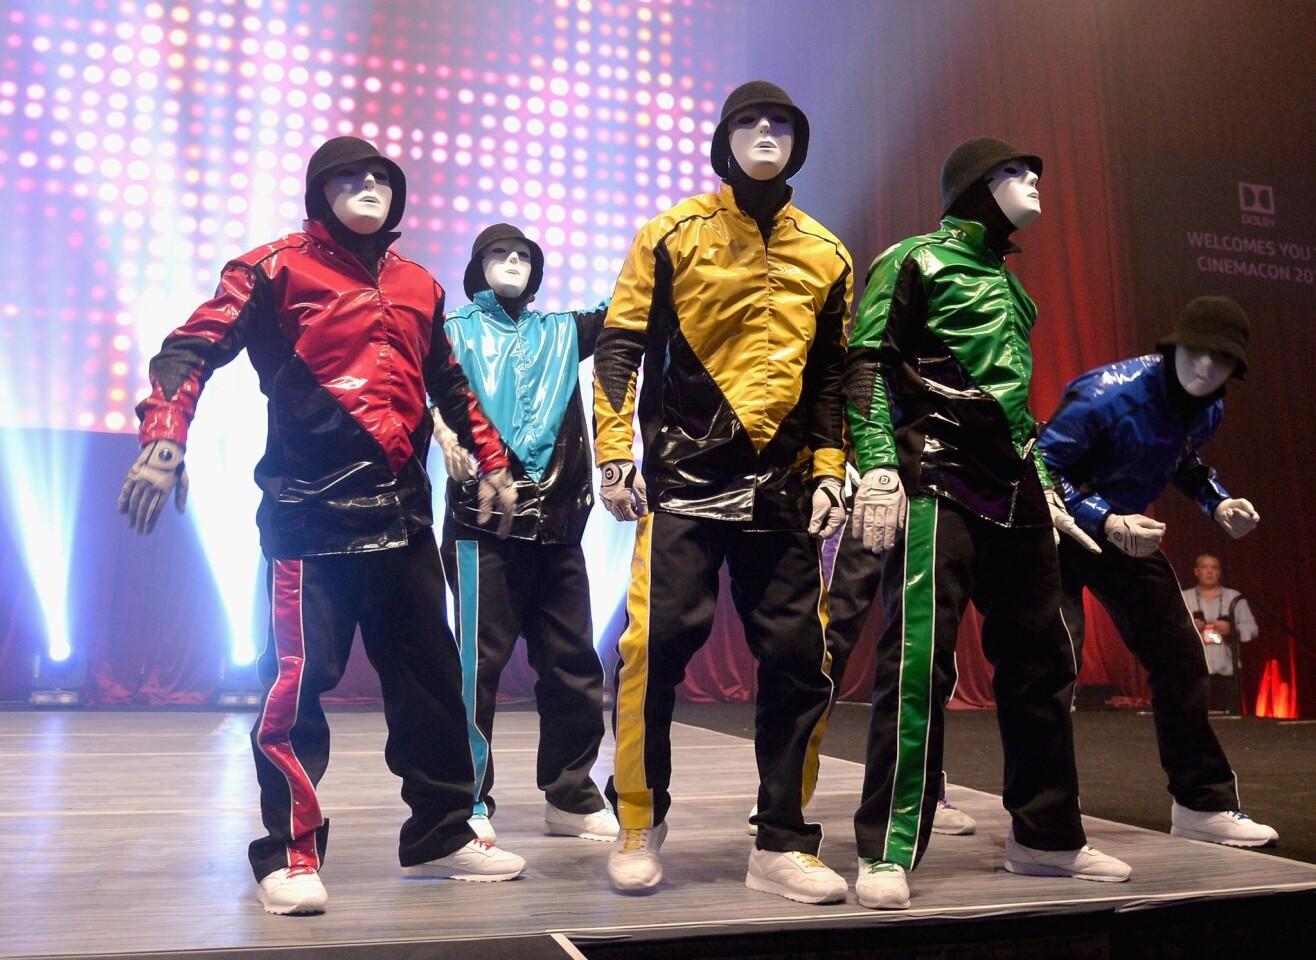 Hip-hop dance crew Jabbawockeez performs at CinemaCon.